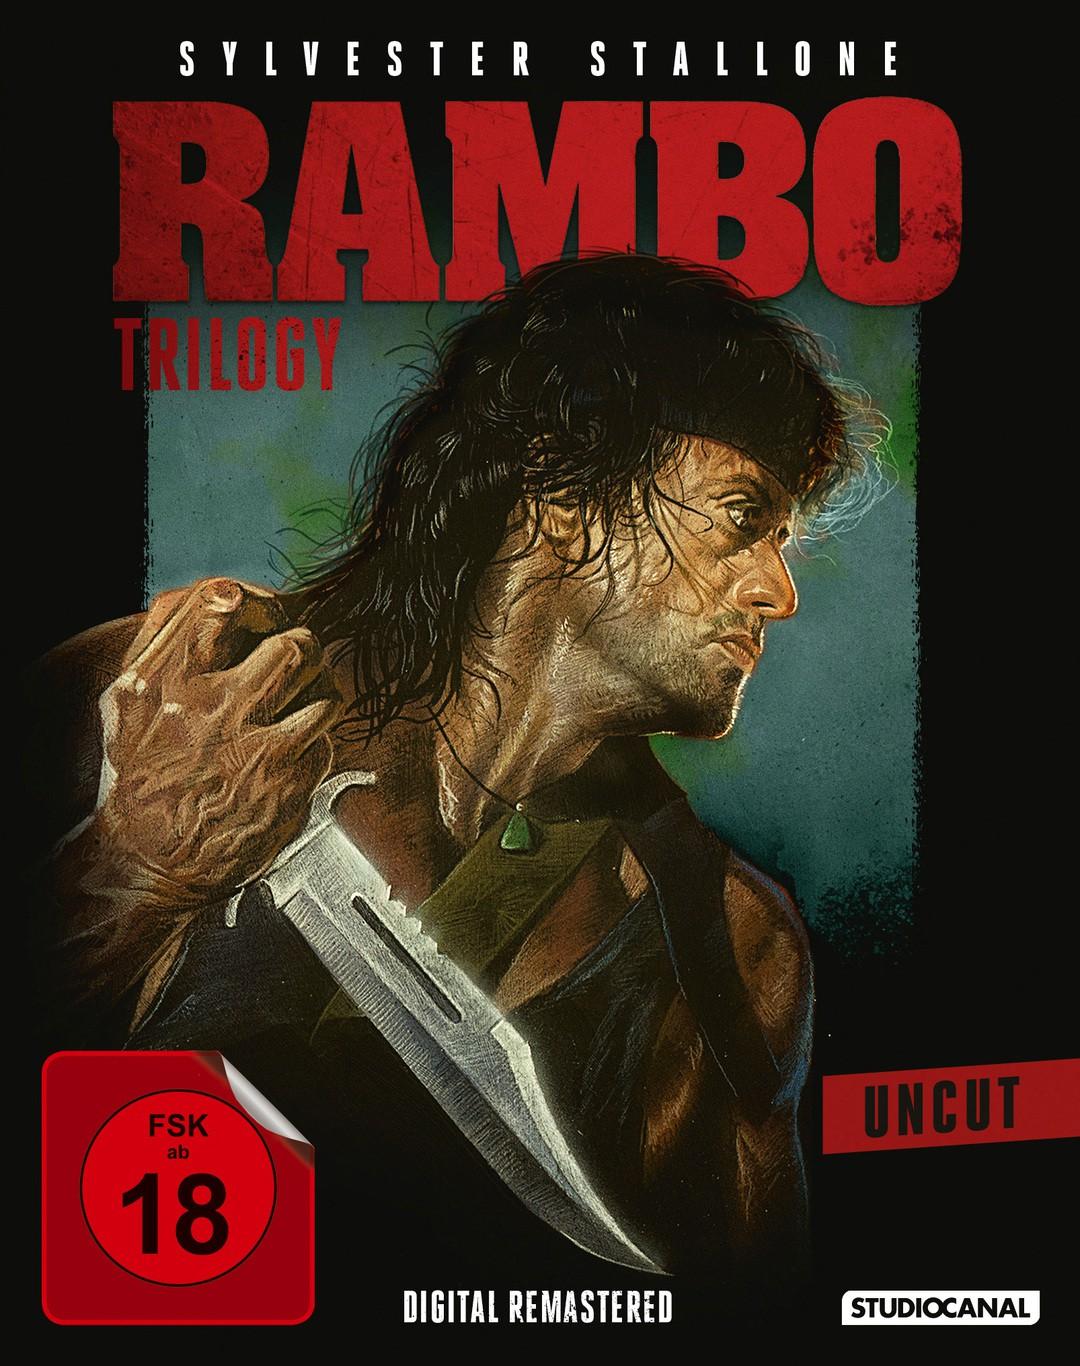 Rambo: Trilogie in 4k - Bild 1 von 4